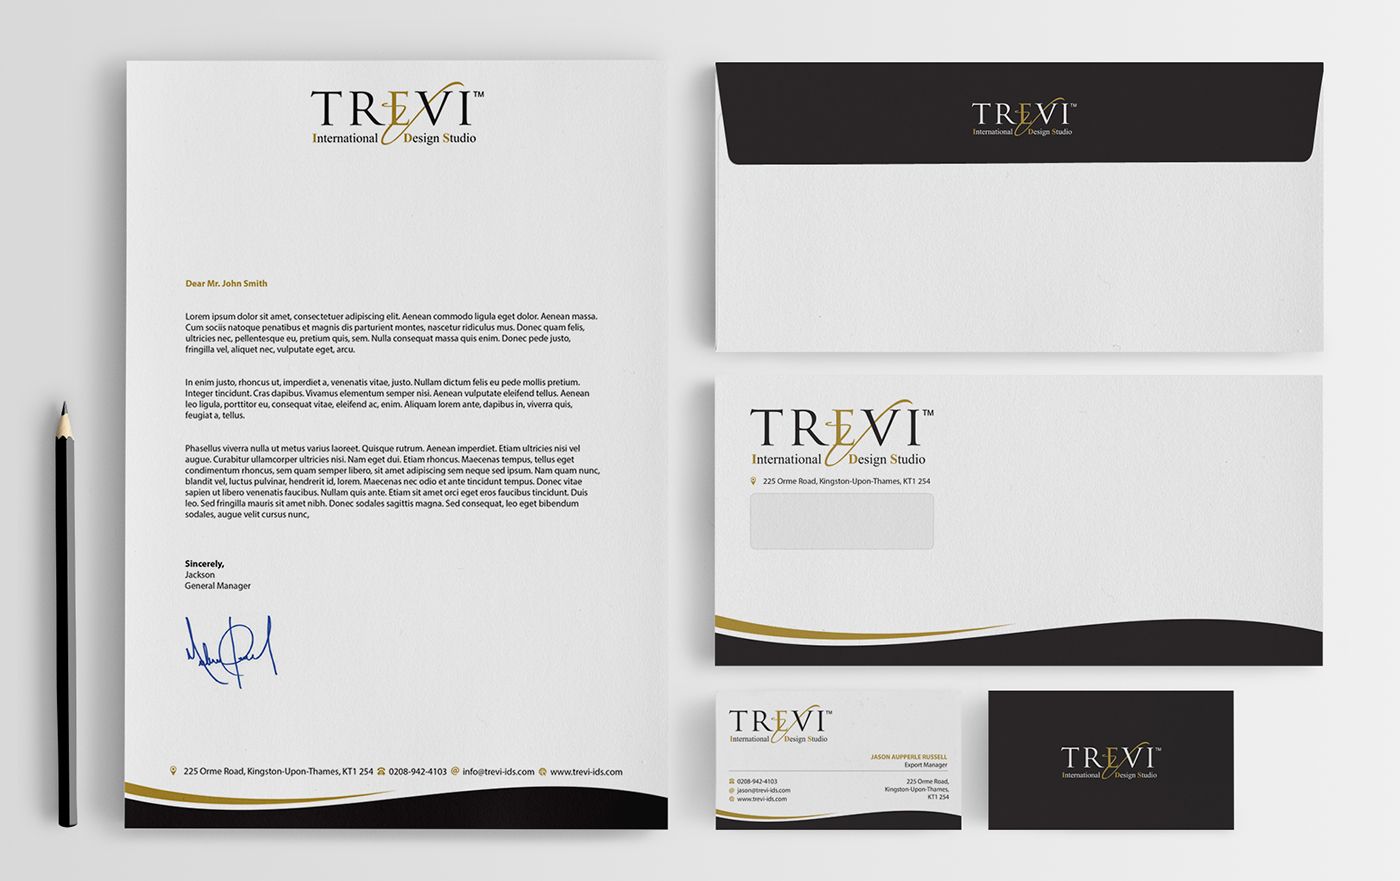 Upmarket modern it company stationery design for trevi for Hispano international decor llc